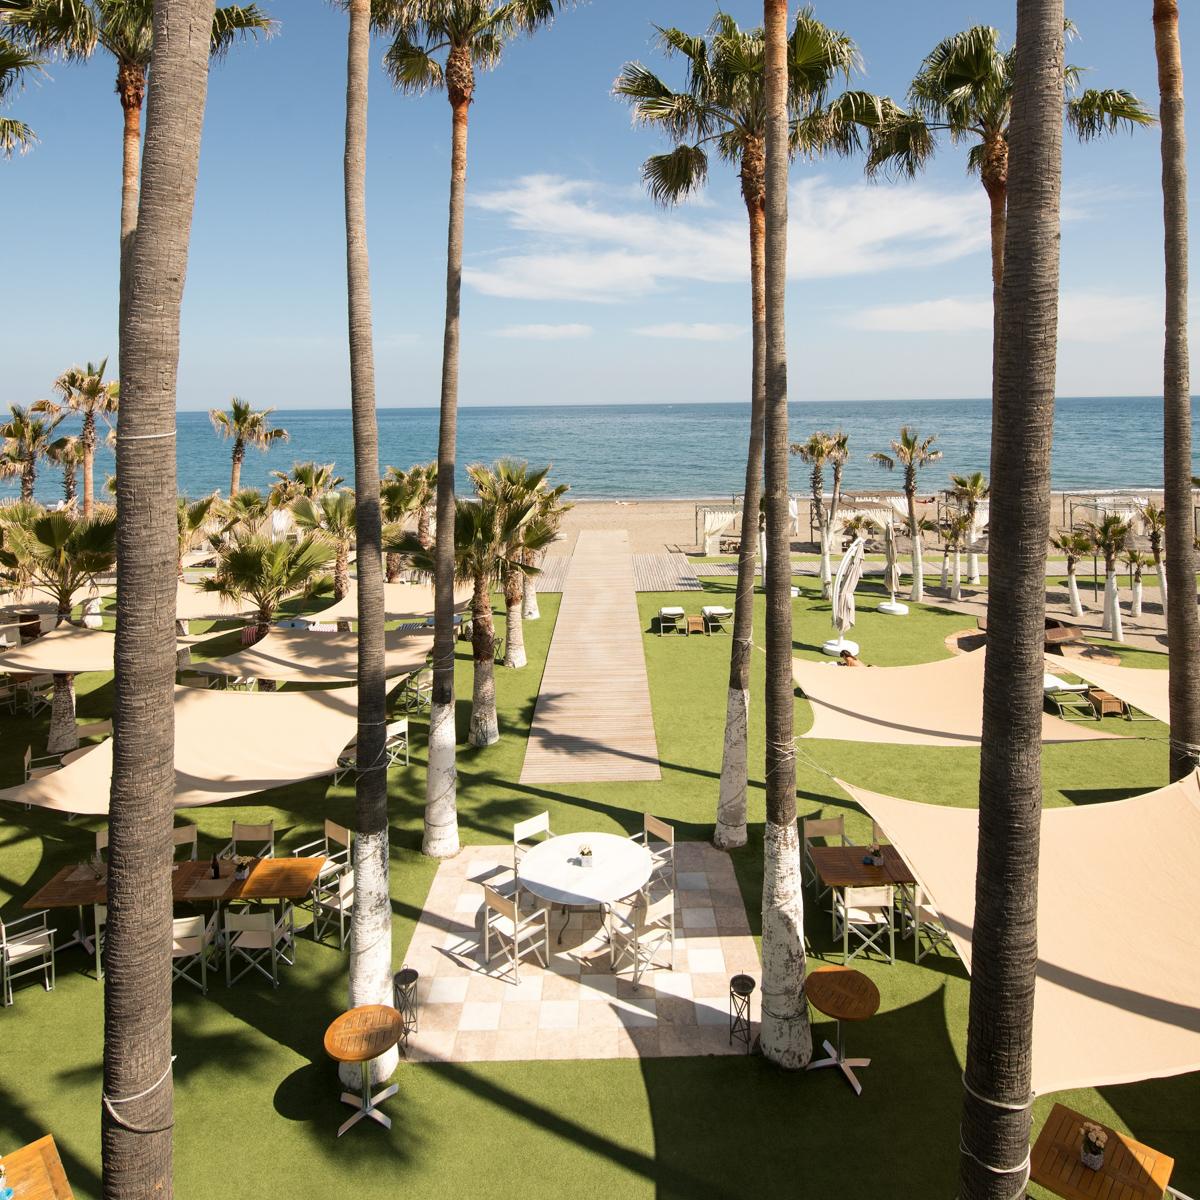 Anantara Luxus Hotel in Marbella